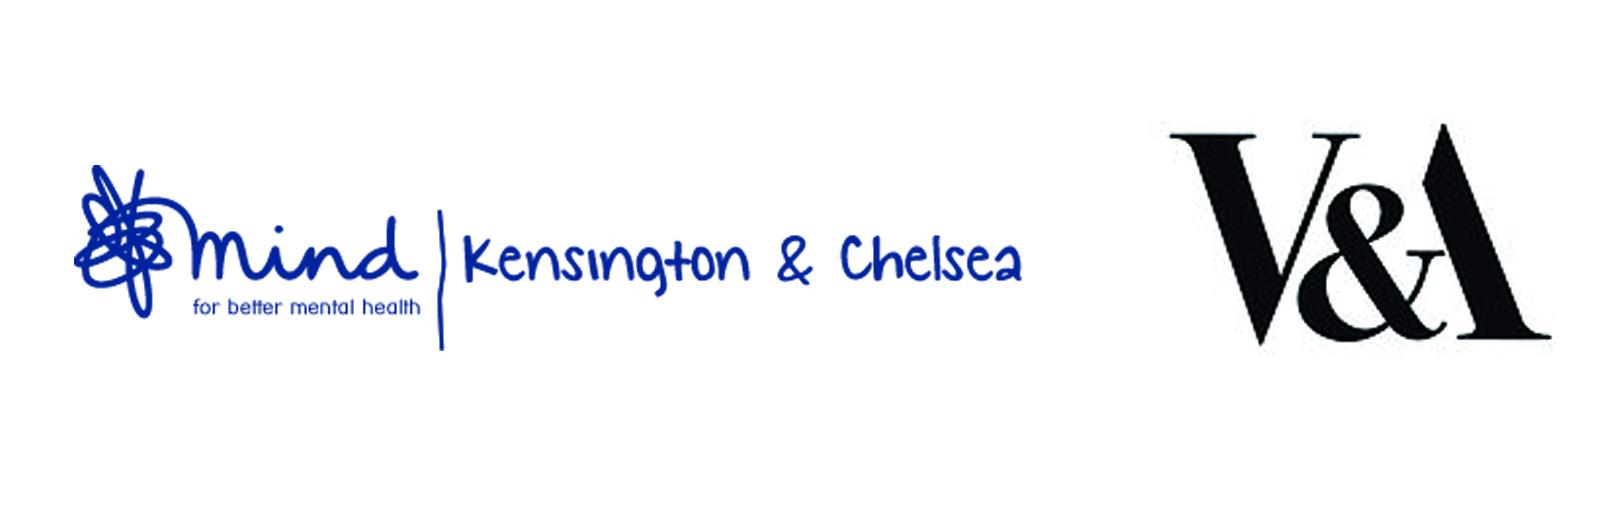 Kensington&Chelsea Mind.jpg